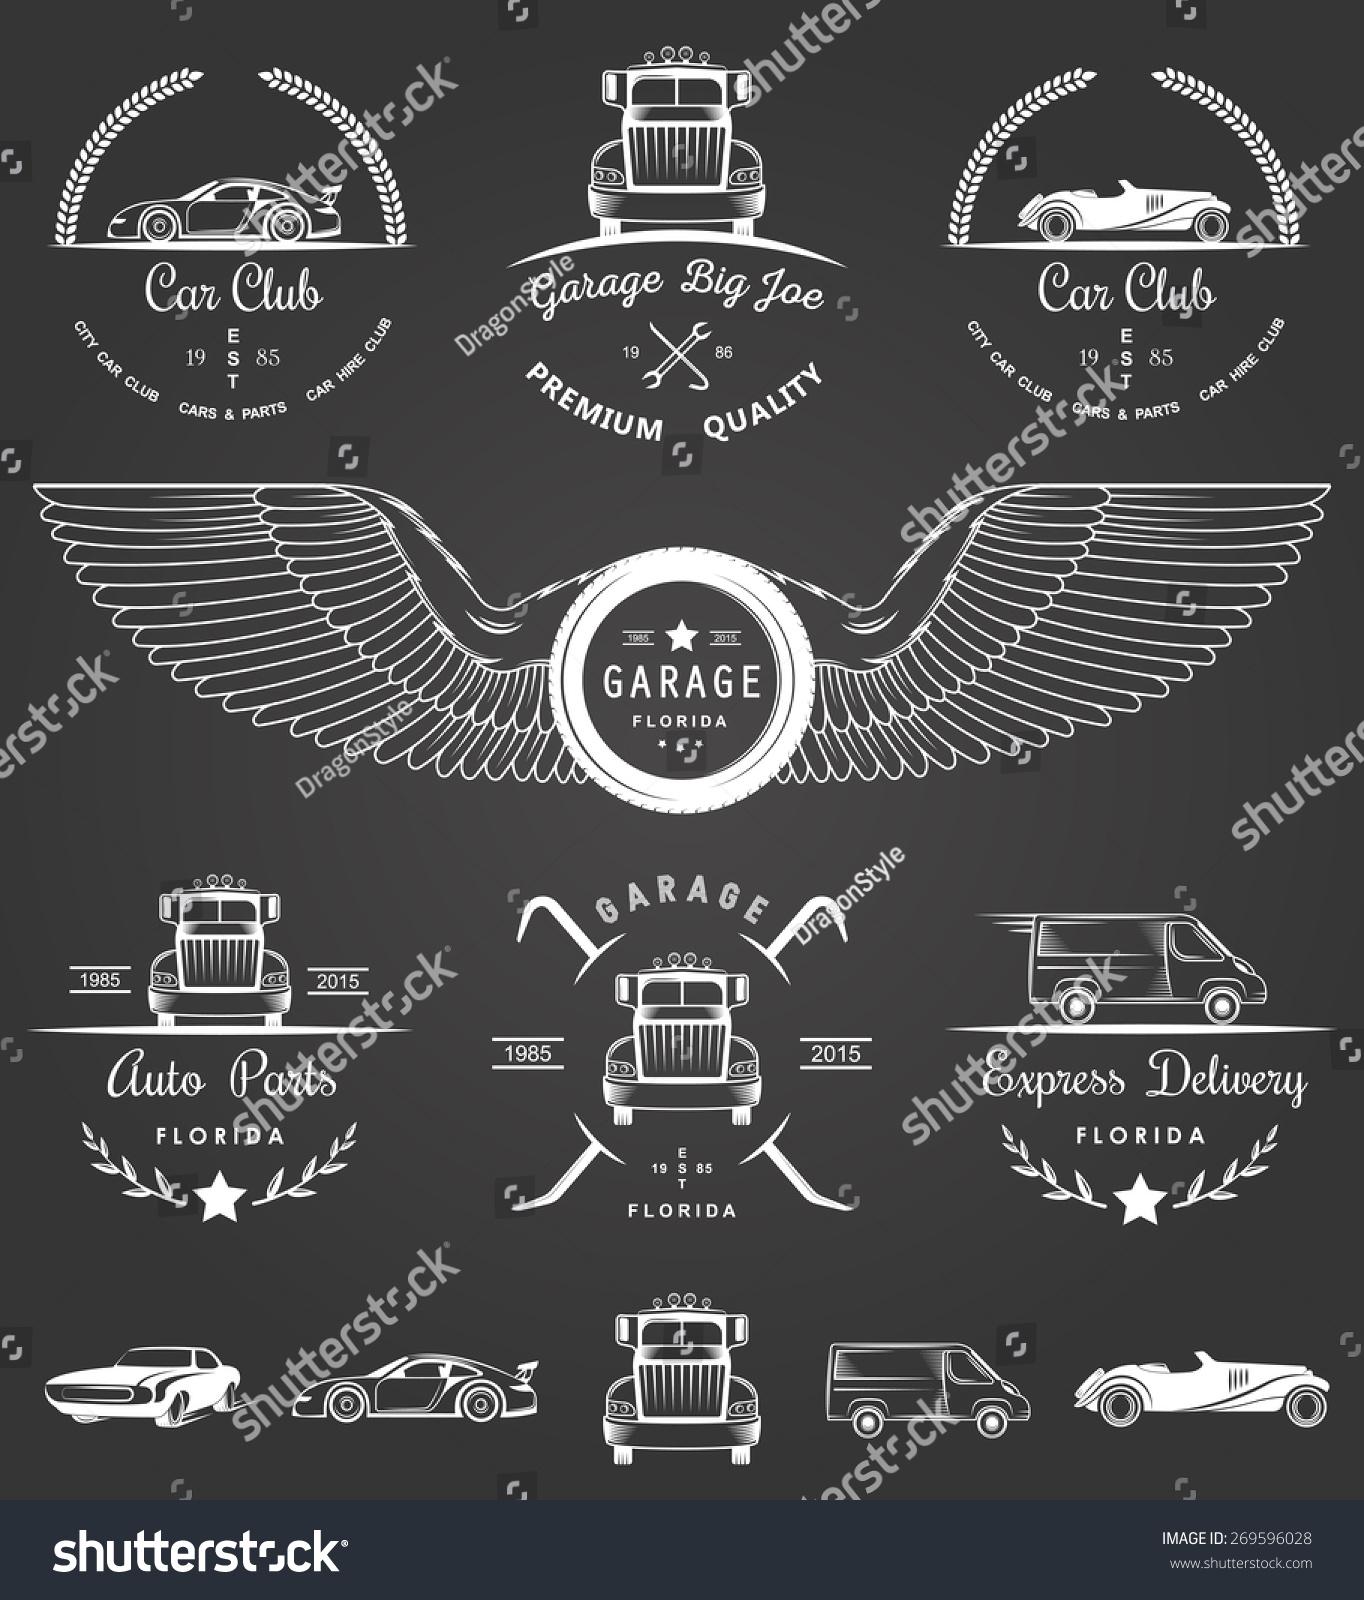 Design car club logo - Set Of Vintage Car Club Drift Club Auto Parts And Garage Labels Badges